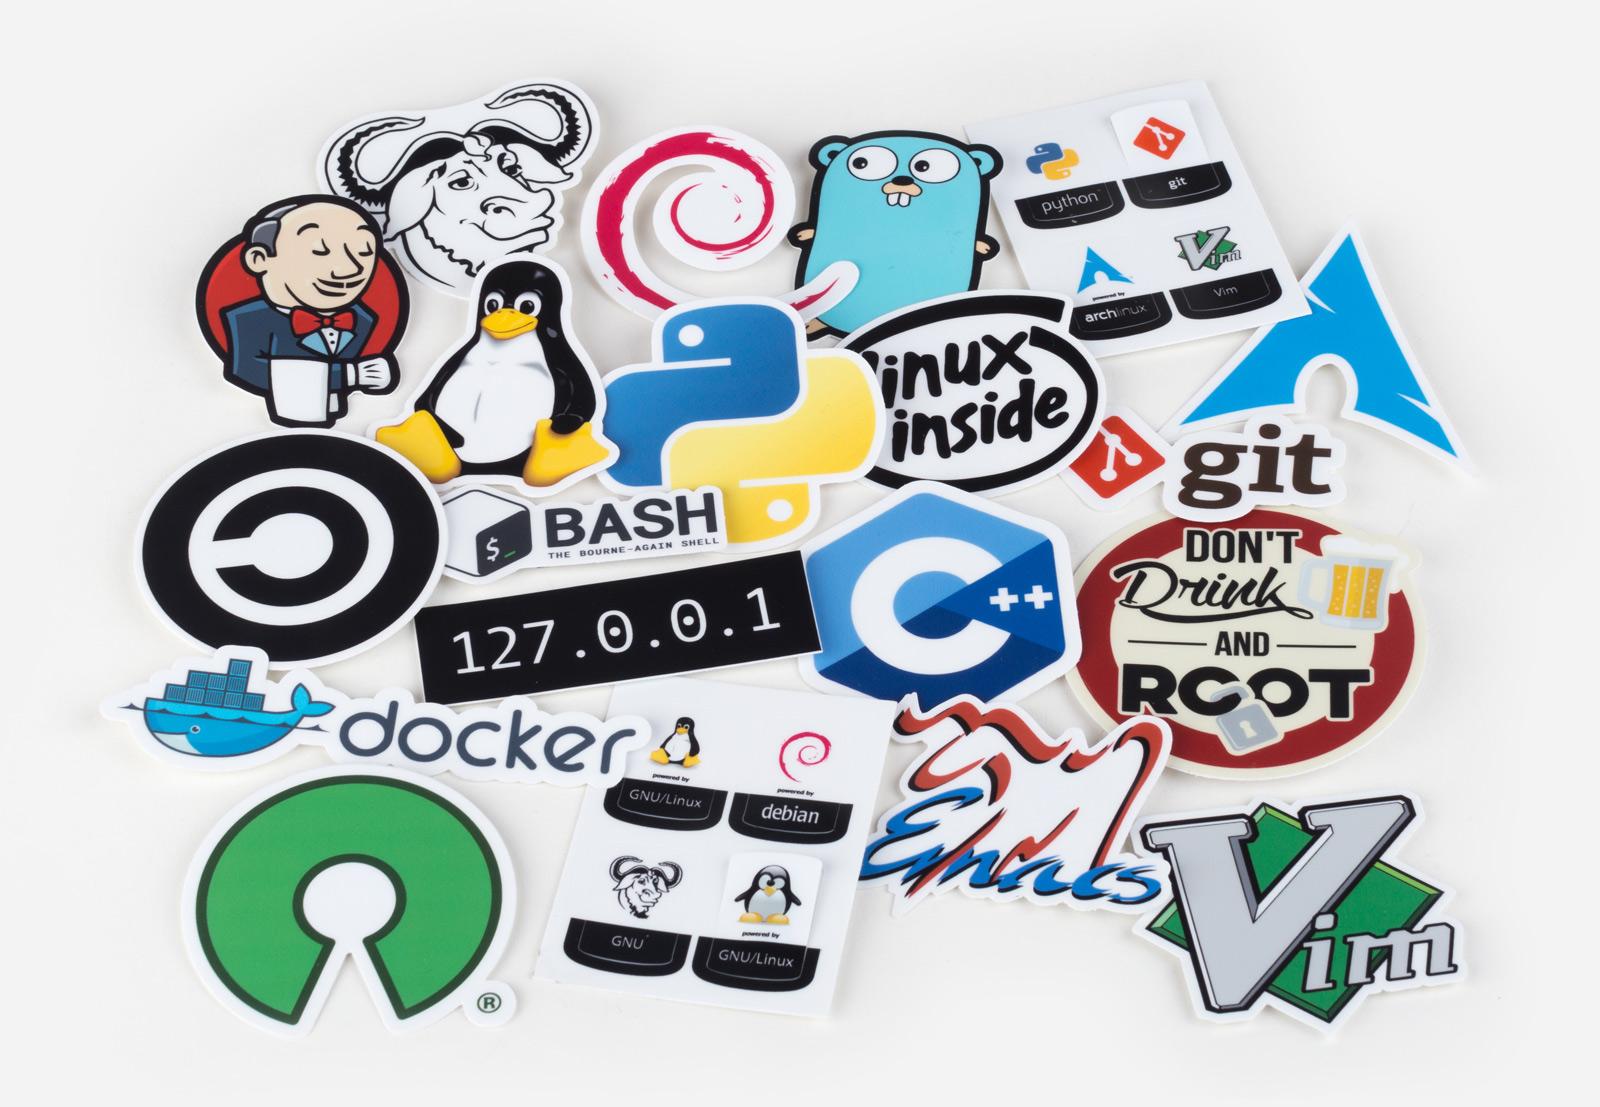 Unixstickers - Elite pack by Sticker Mule